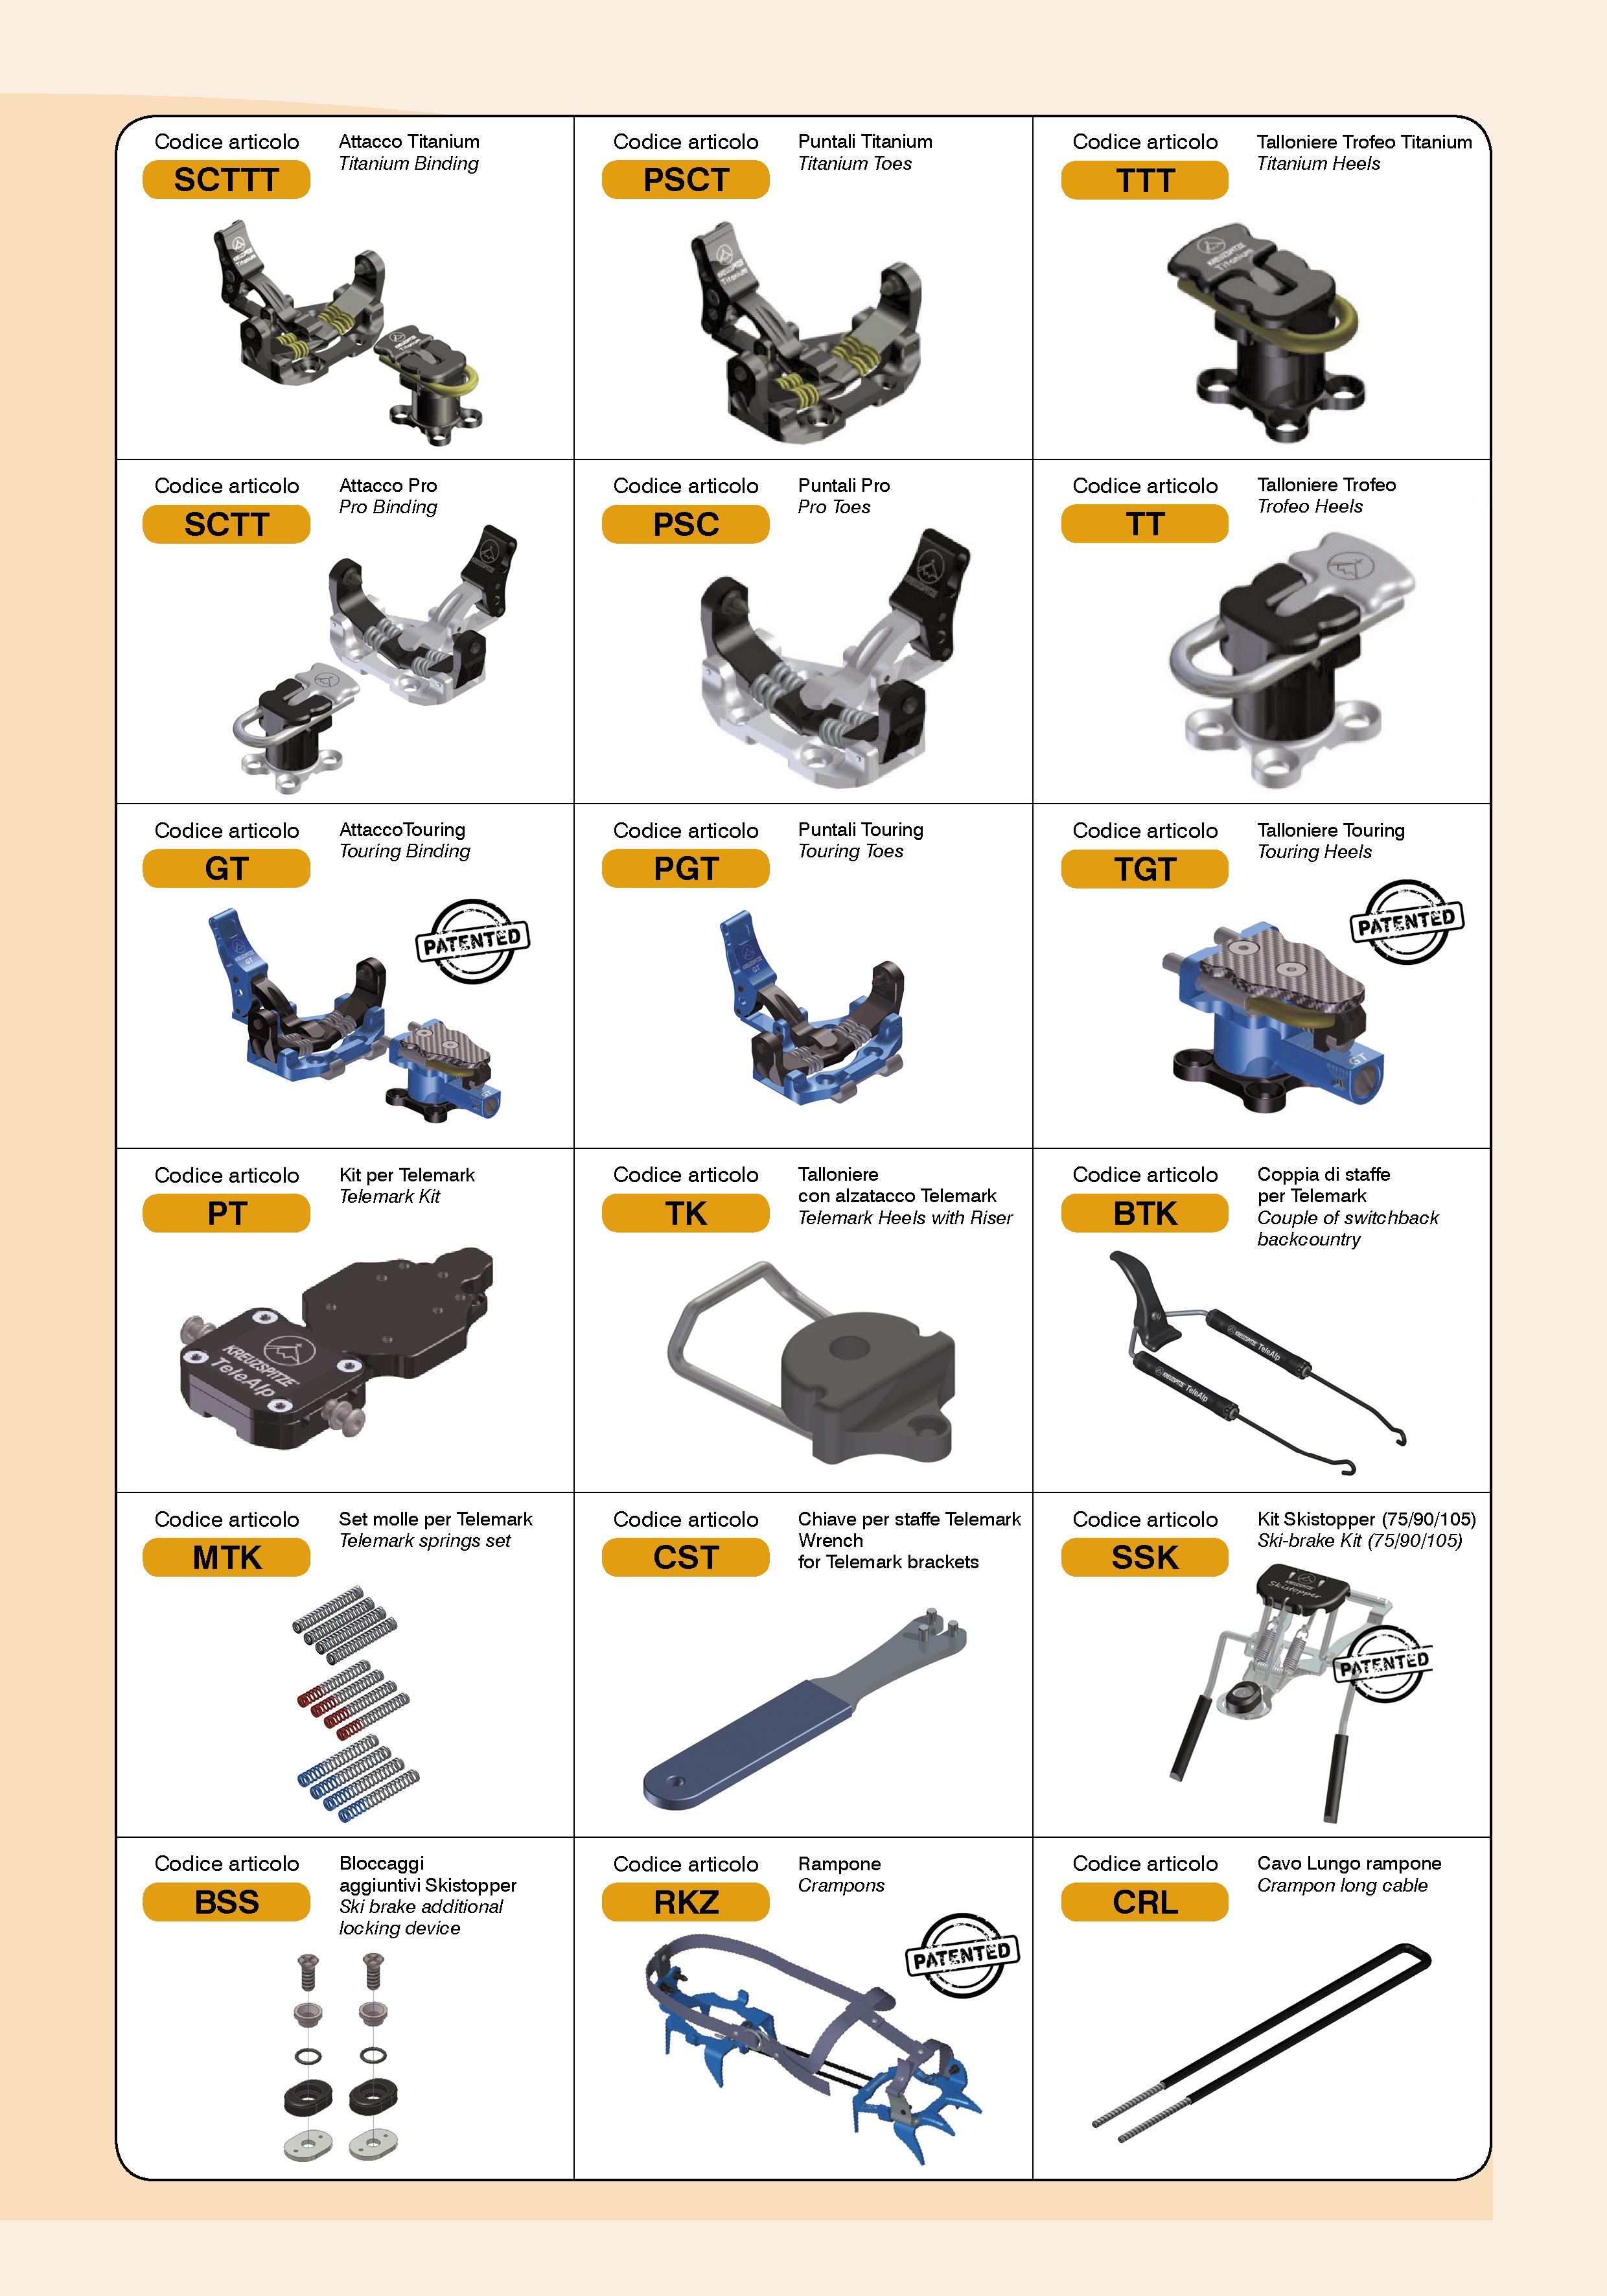 Catalogo prodotti Kreuzspitze 2017-18_1-3